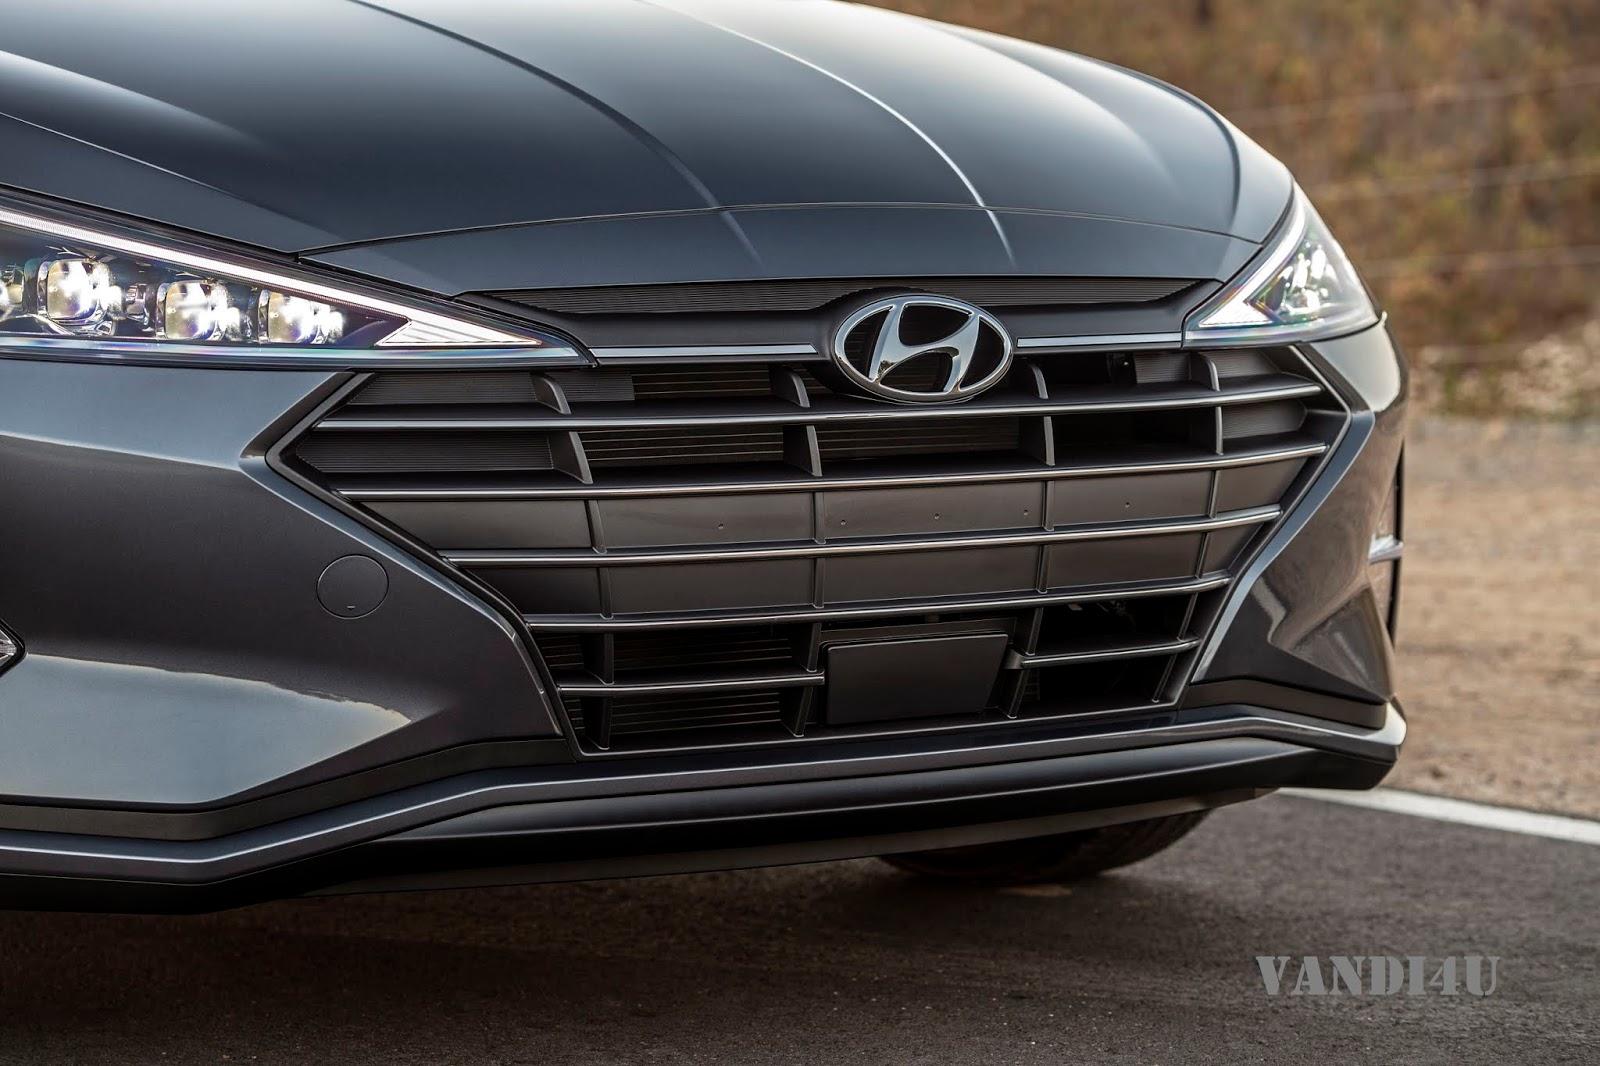 2020 Hyundai Elantra: Top 5 things to know | VANDI4U